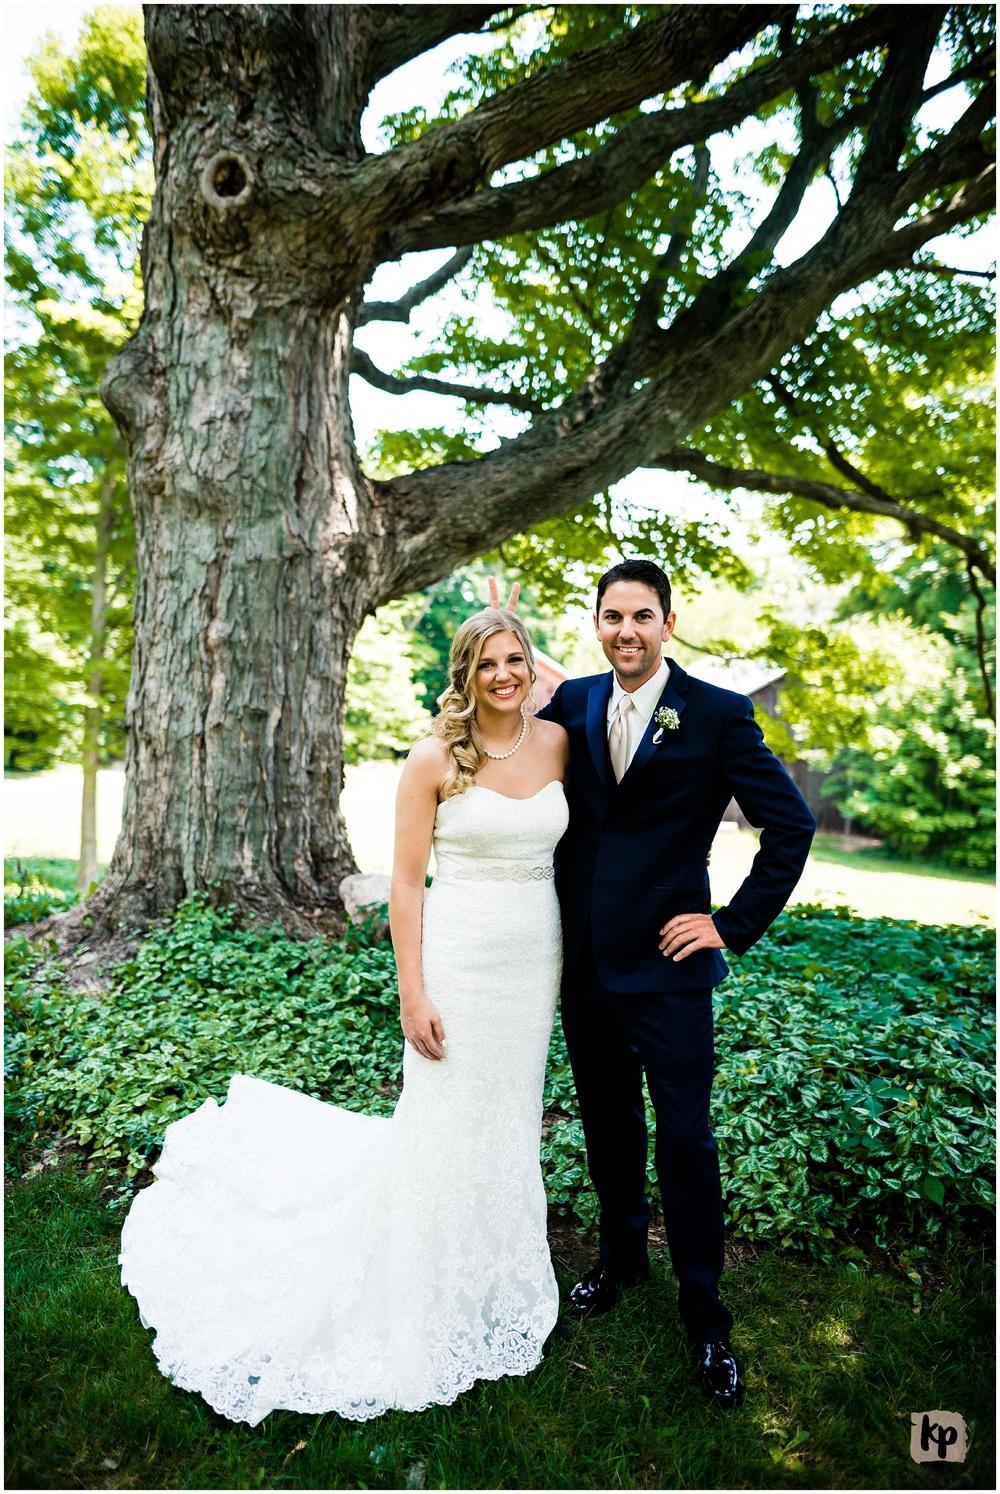 Matthieu + Katlyn | Just Married #kyleepaigephotography_0079.jpg